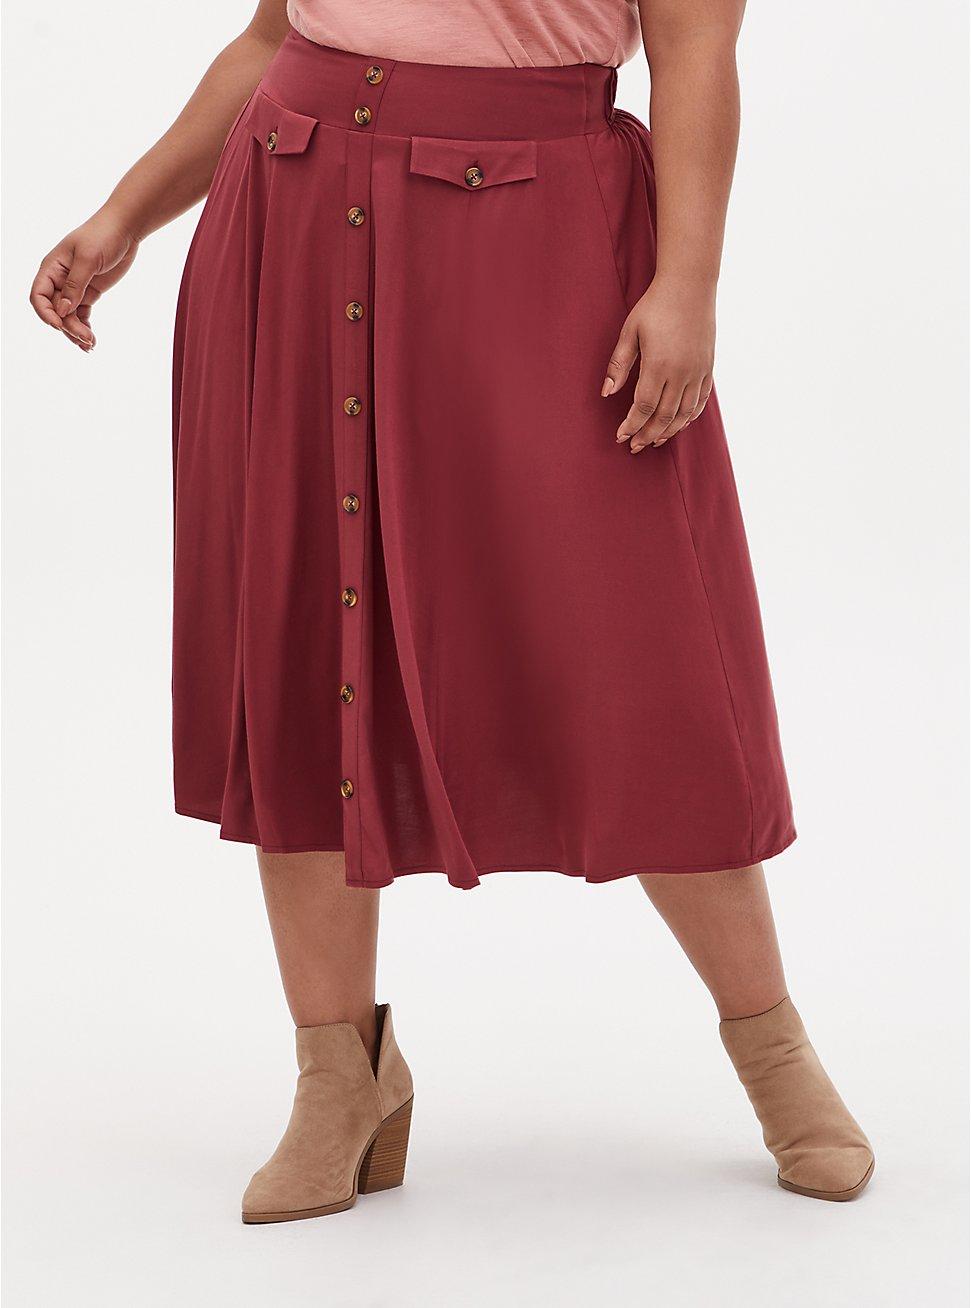 Dark Red High Waist Button Midi Skirt , CURRENT EVENTS, hi-res